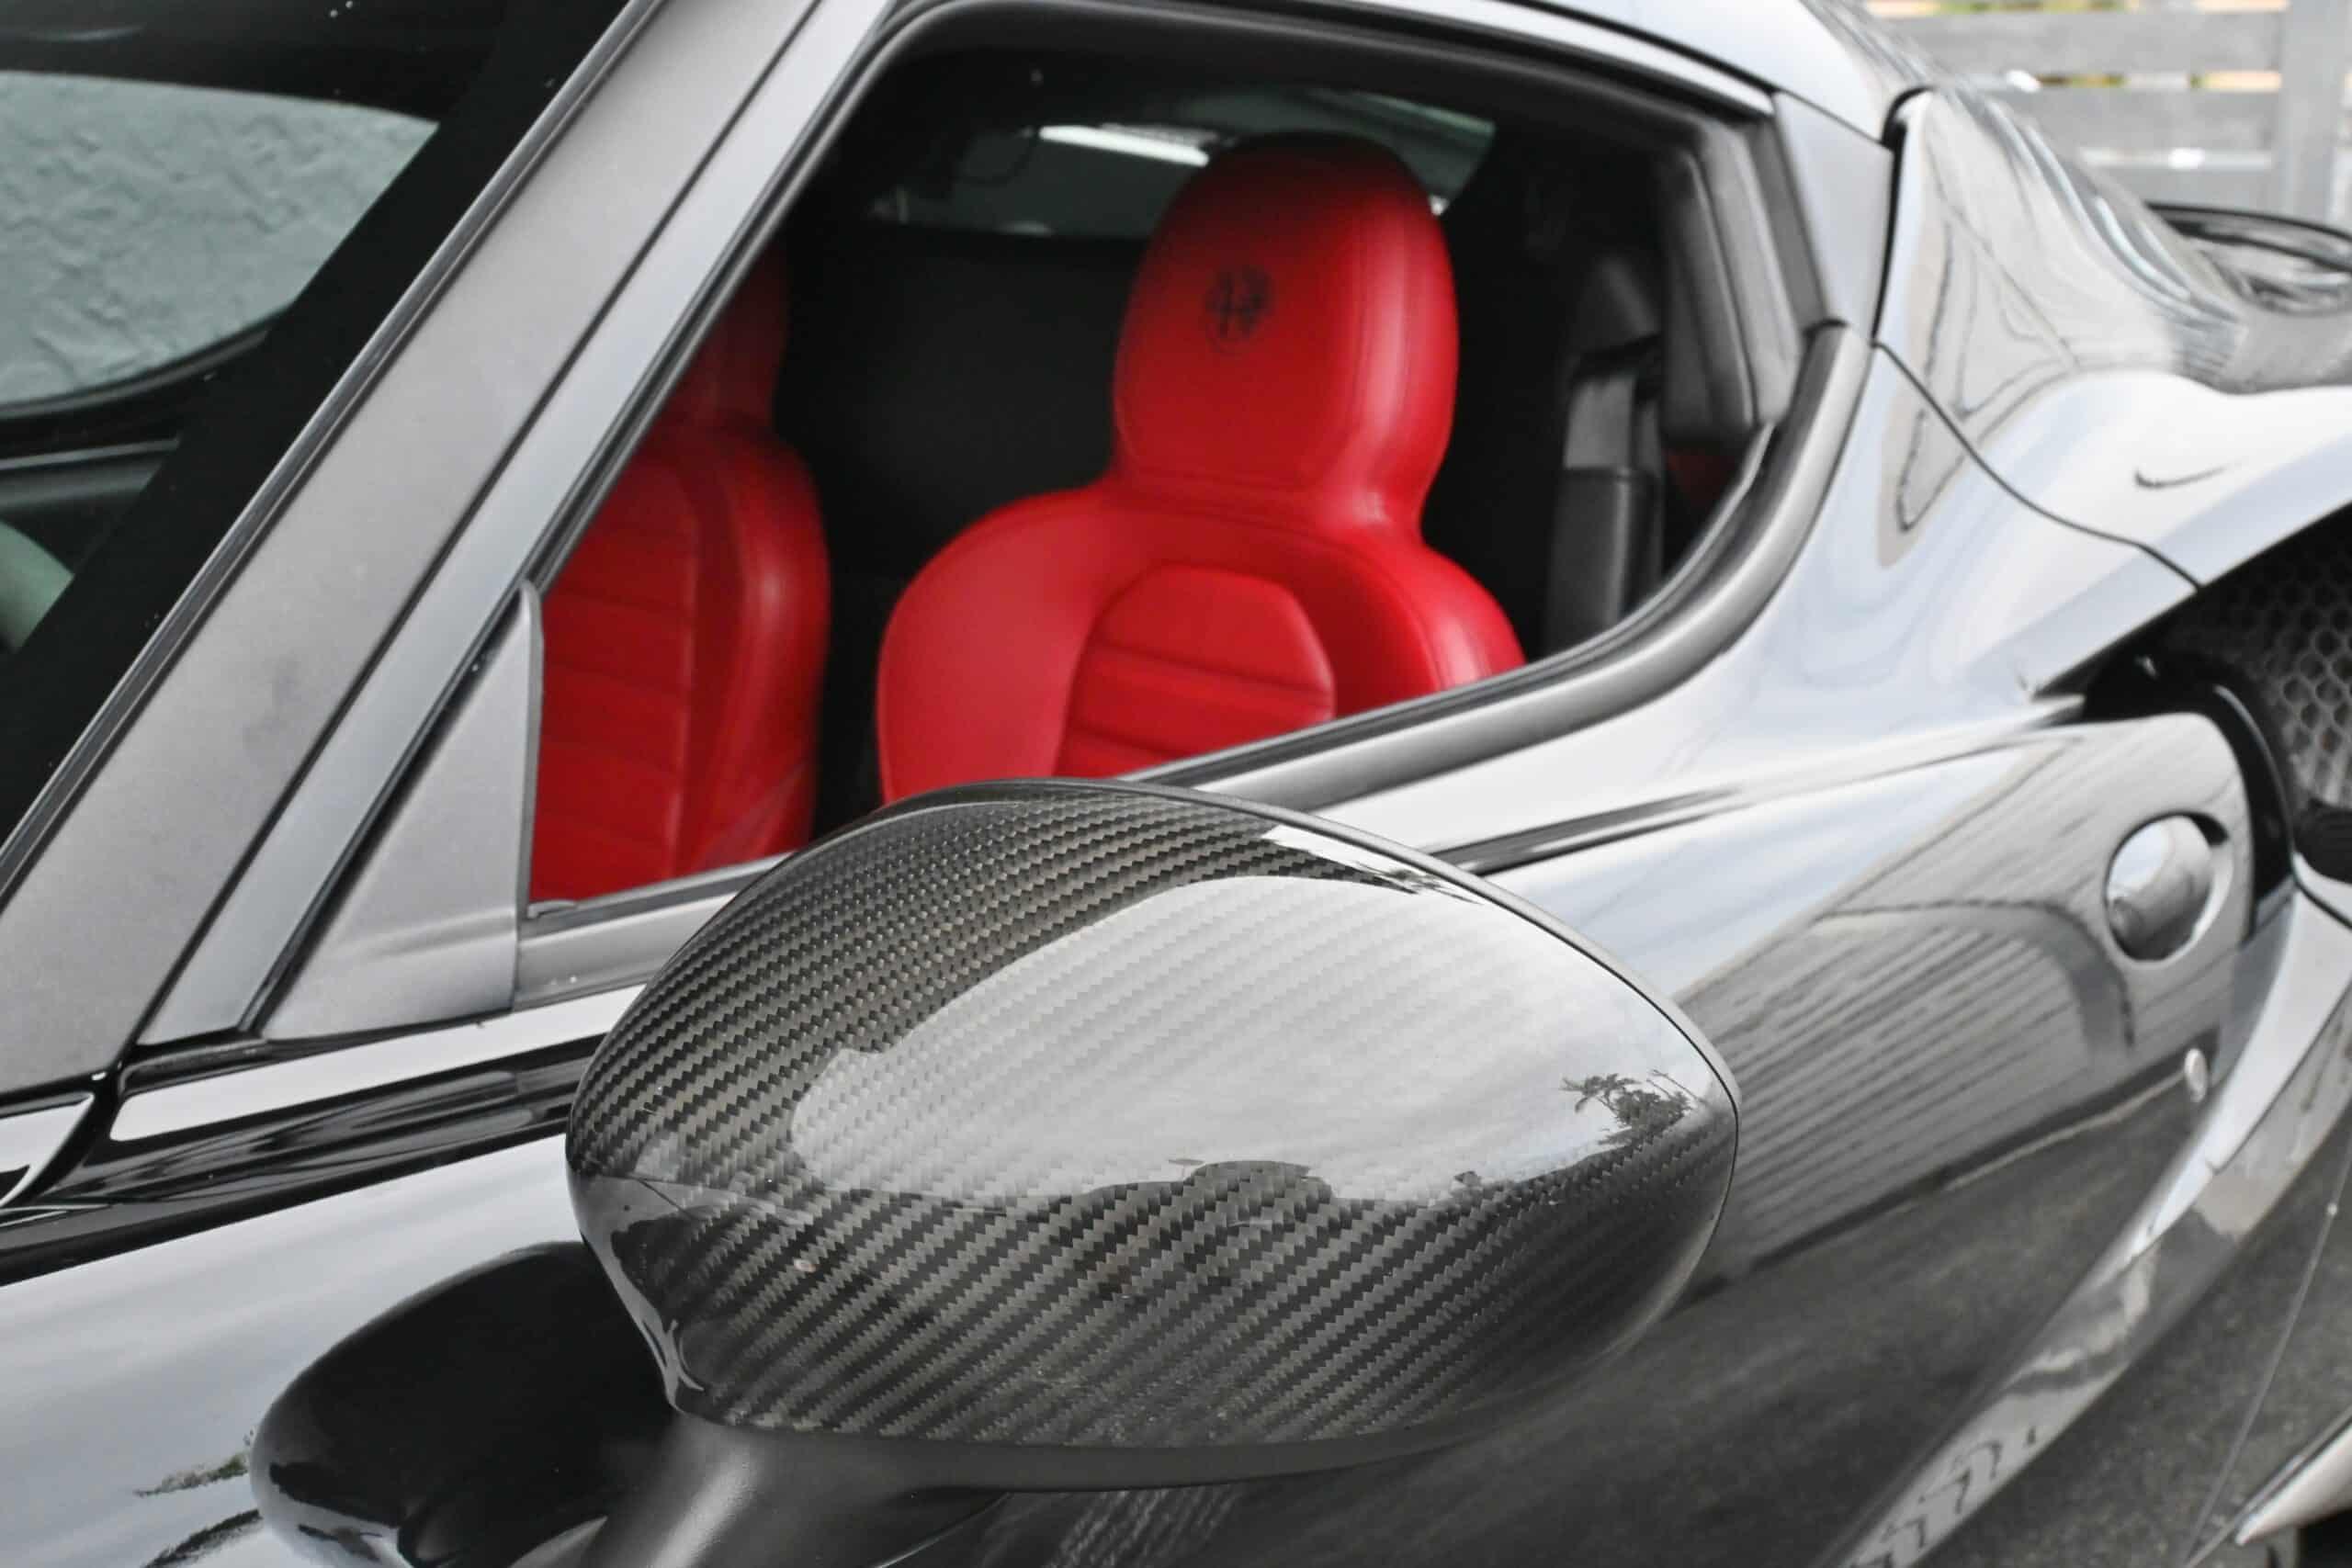 2015 Alfa Romeo 4C Only 24K Miles/ Original Paint/ Fresh Major Service At Dealership/ Fully LOADED